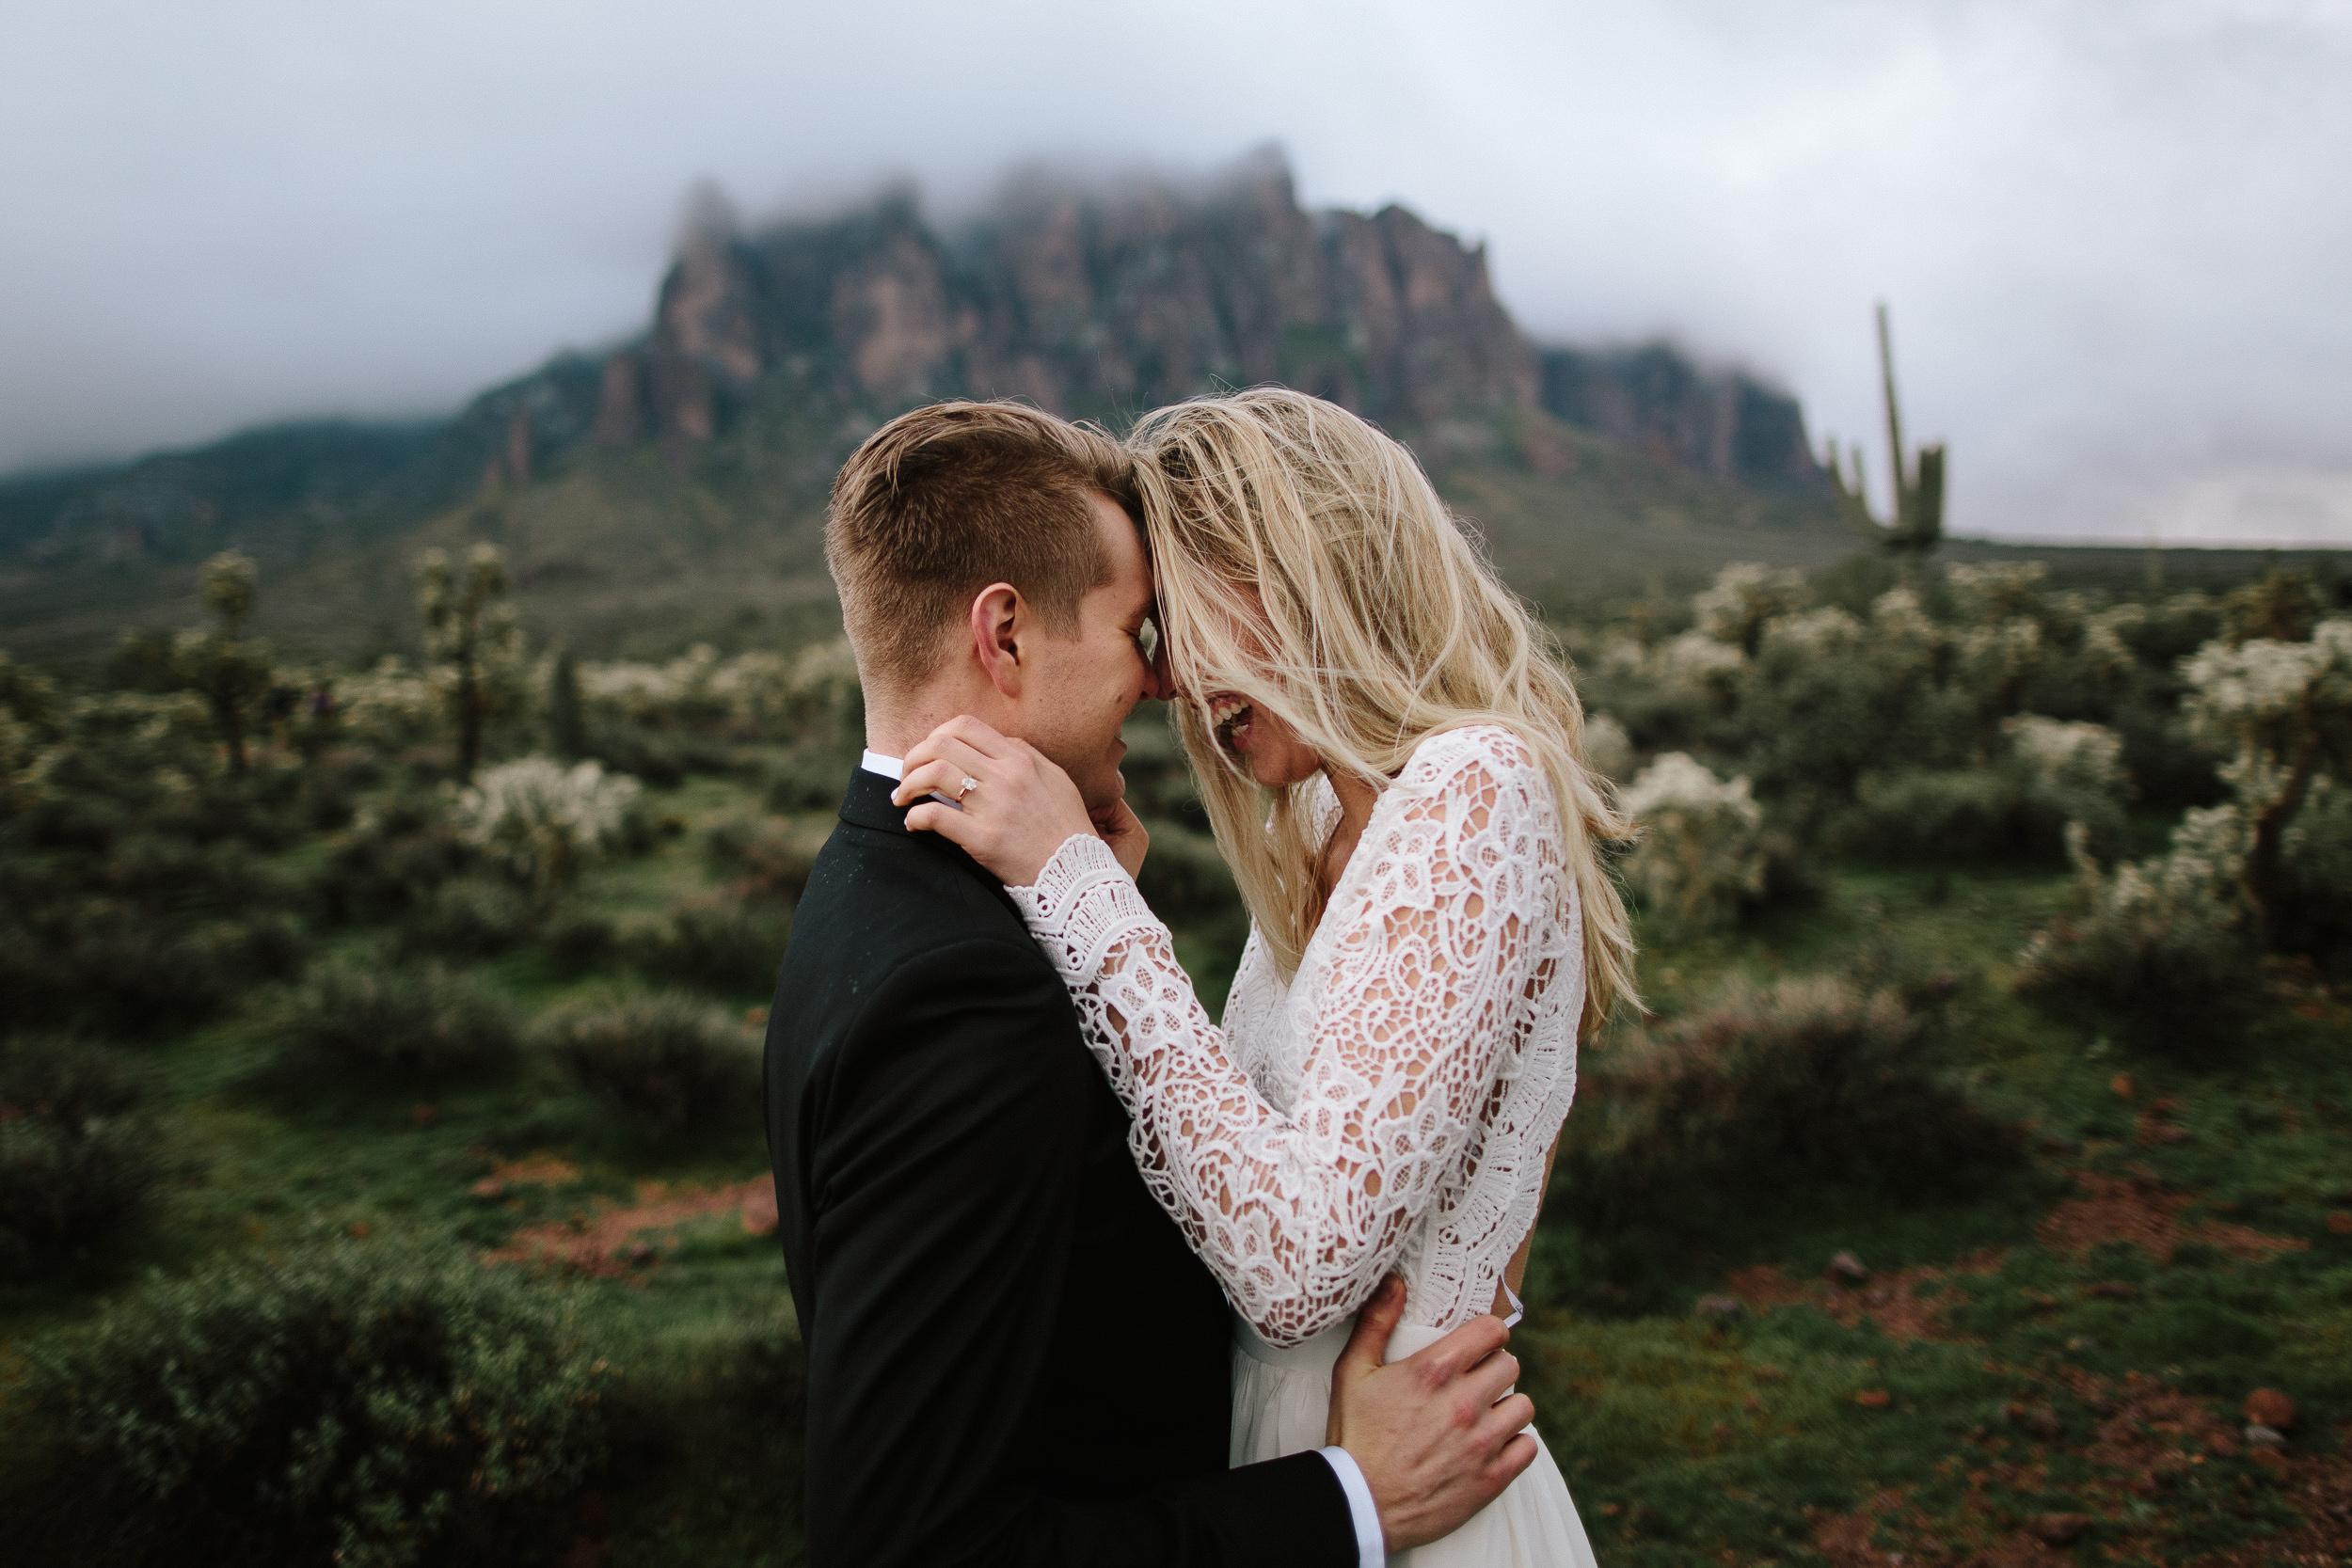 phoenix-mesa-elopement-wedding-photographer-lost-dutchman-state-park-superstitious-mountains-21.jpg